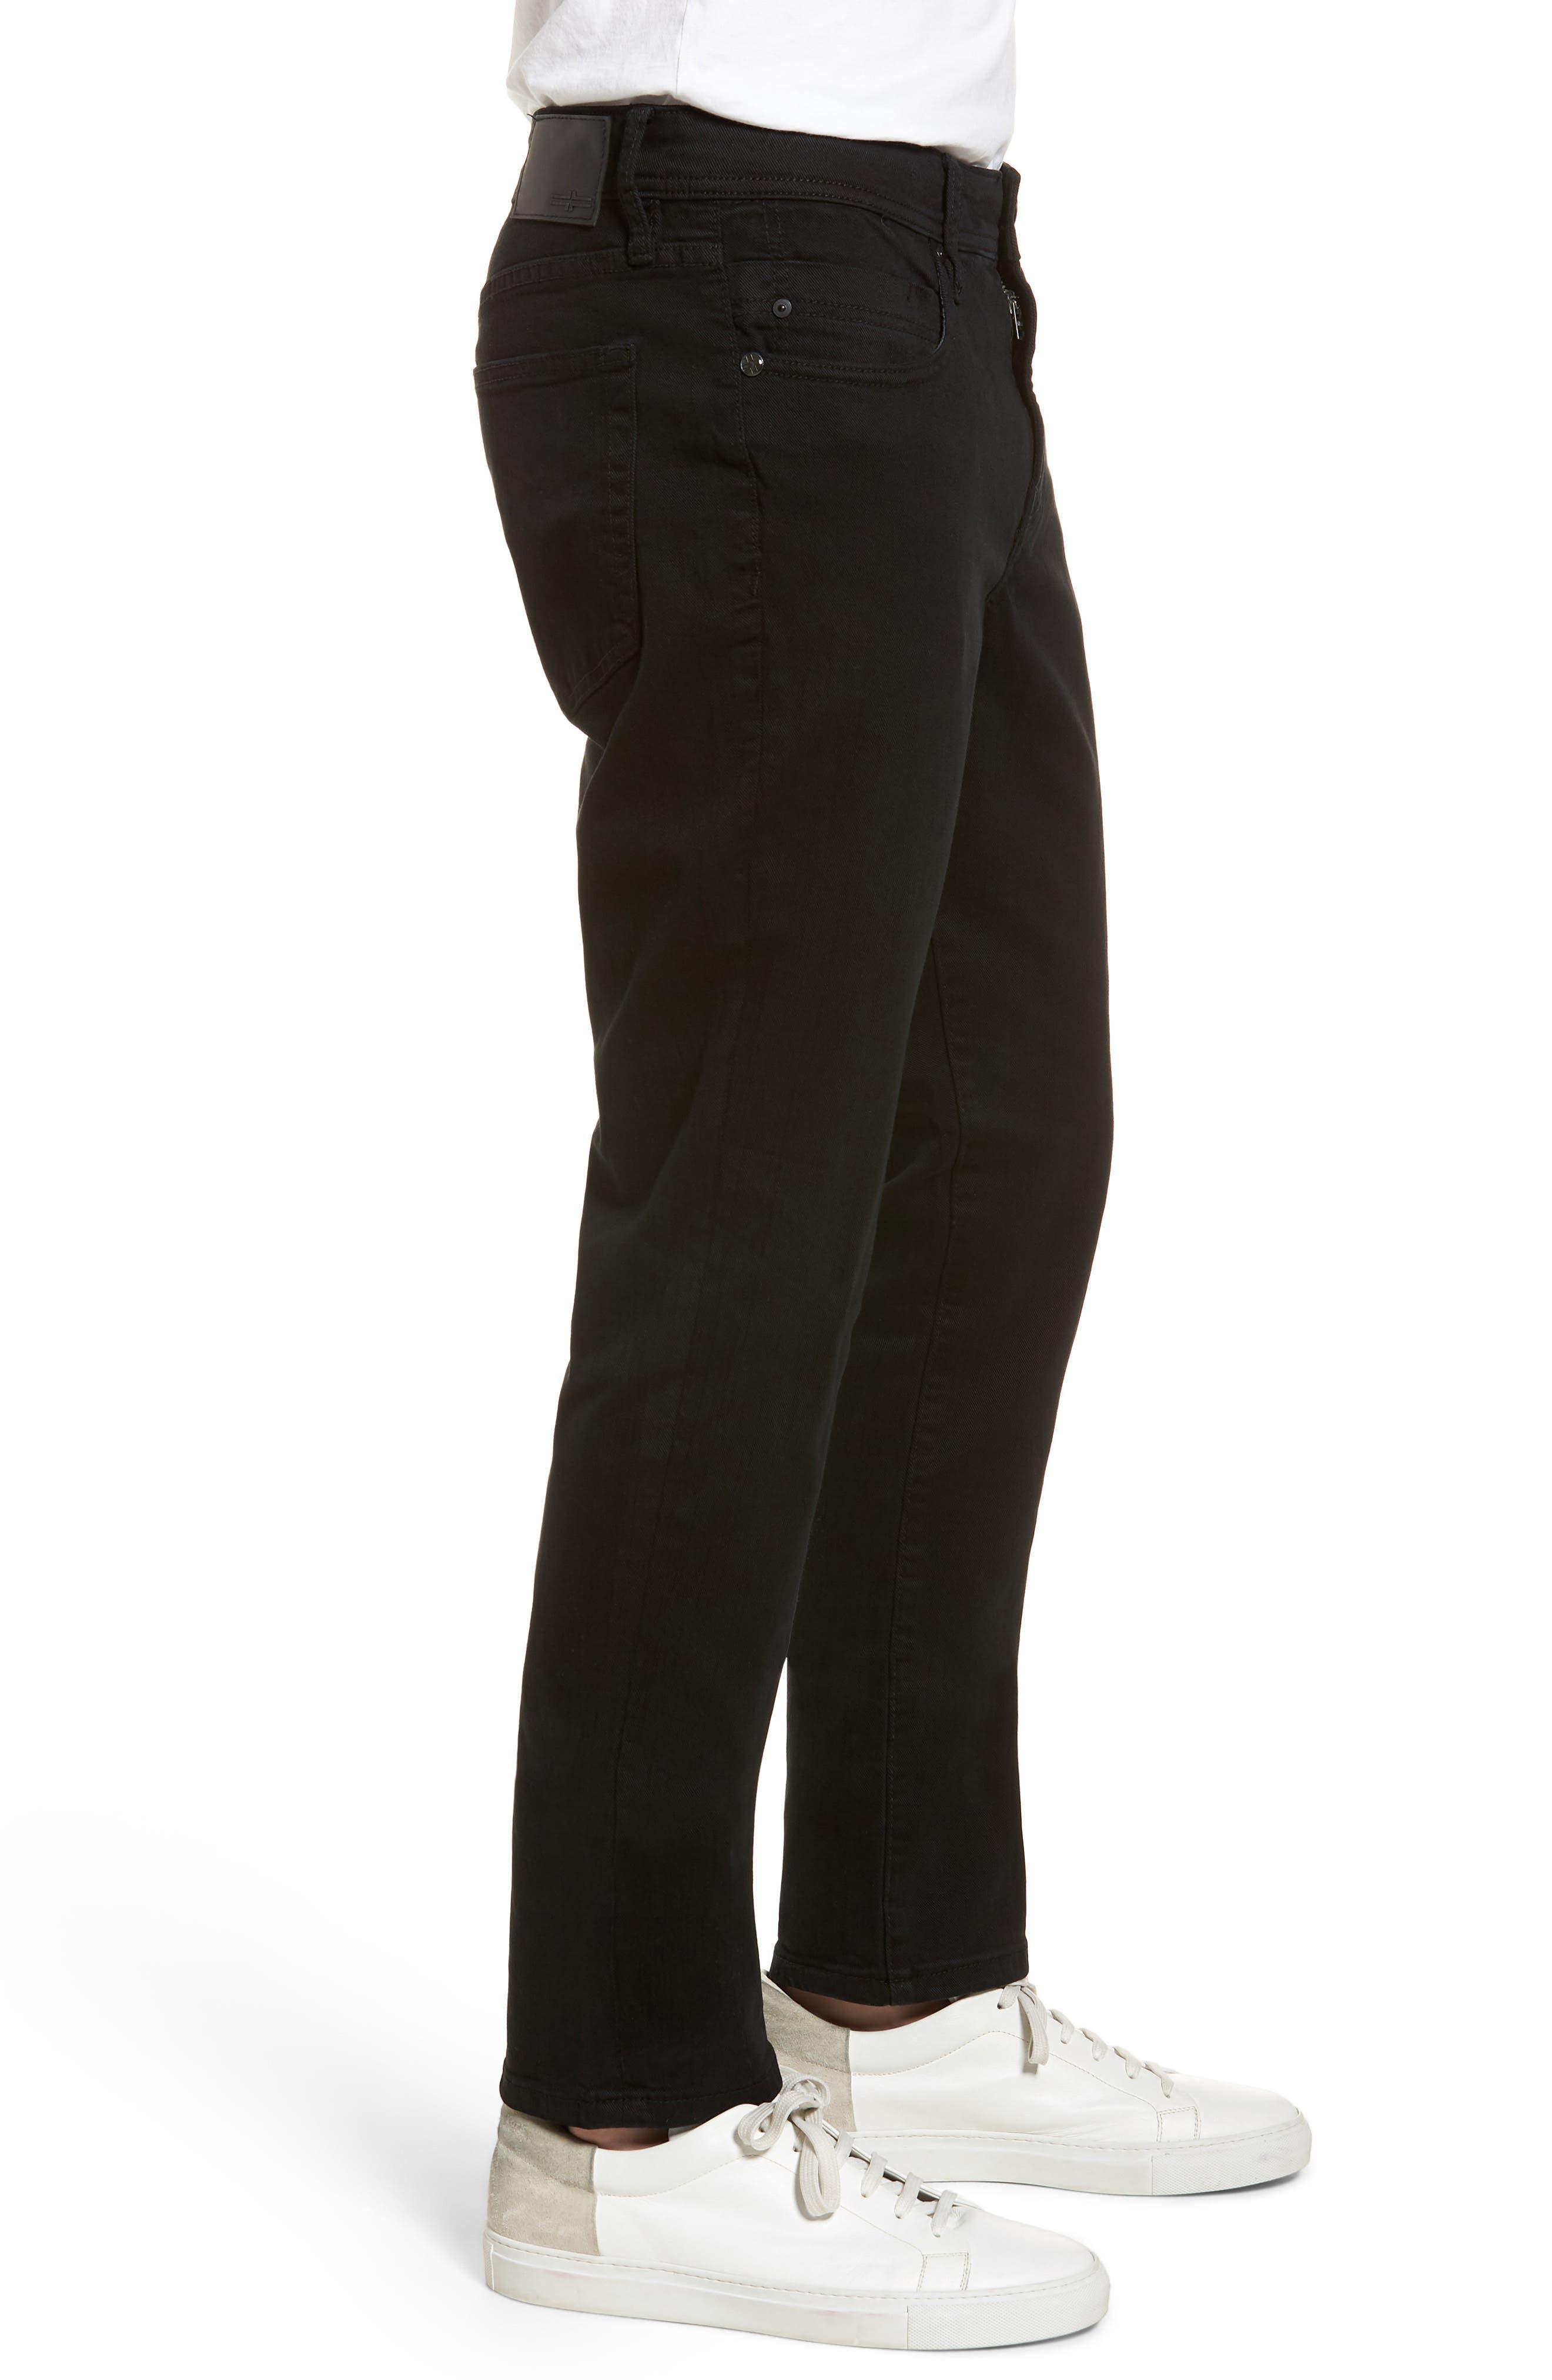 Jeans Co. Kingston Slim Straight Leg Jeans,                             Alternate thumbnail 3, color,                             Black Rinse